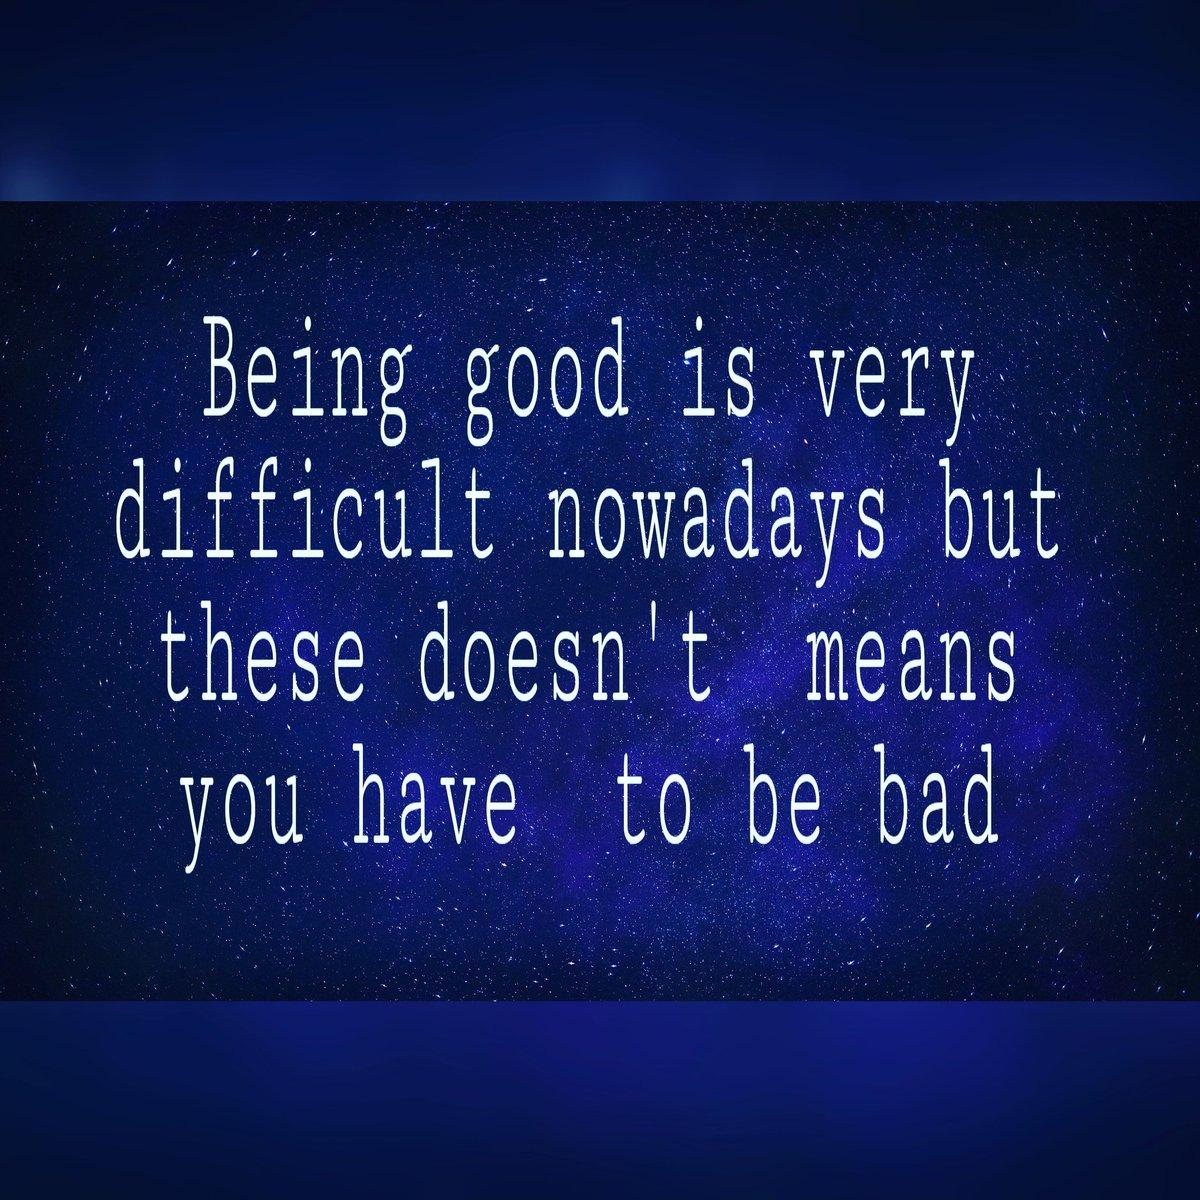 #quotes#quotesoftheday#quotestoliveby#quotestagram#quote#quotesaboutlife#motivationalquotes#inspirationalquotes#quotesinta#quotesgram#lifequotes#relationshipquotes#motivation#motivantional#motivated#motive#postivequotes#successquotes#lifequotes#quotesoftheday#lifequotes <br>http://pic.twitter.com/Zpm9ppBoCW